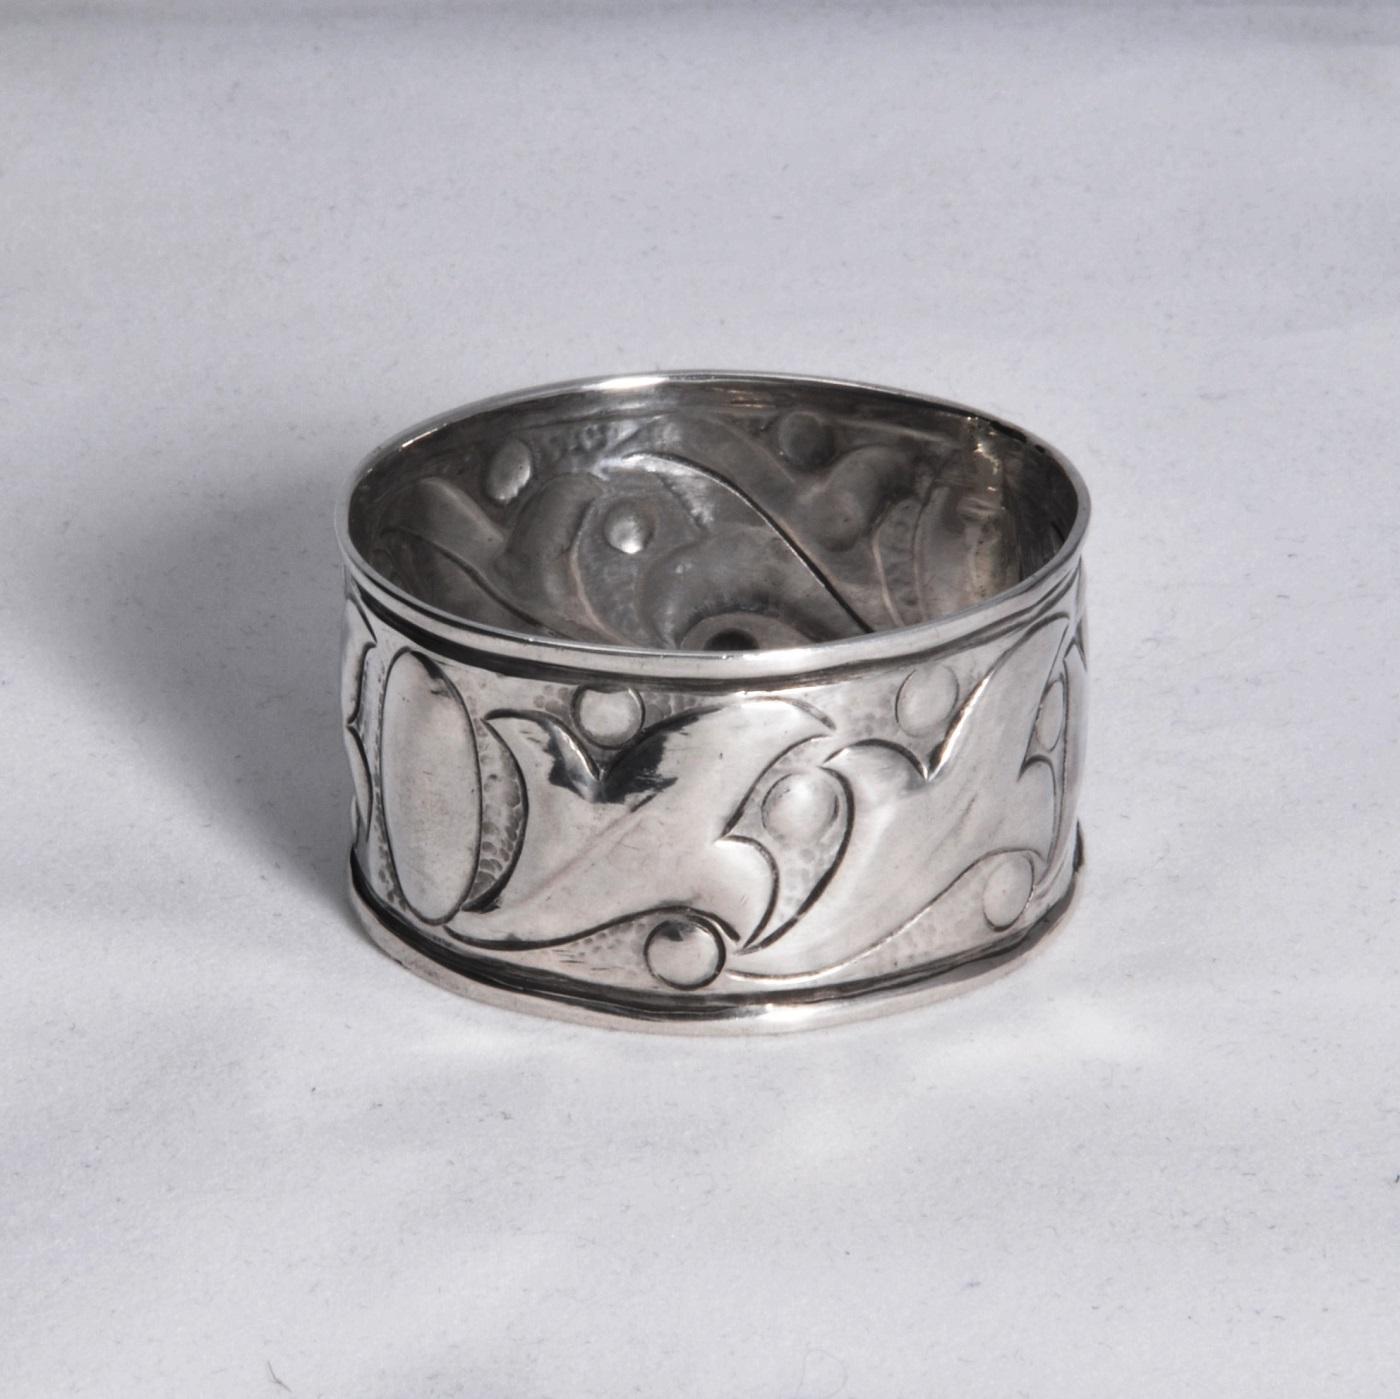 Keswick School of Industrial Arts napkin ring